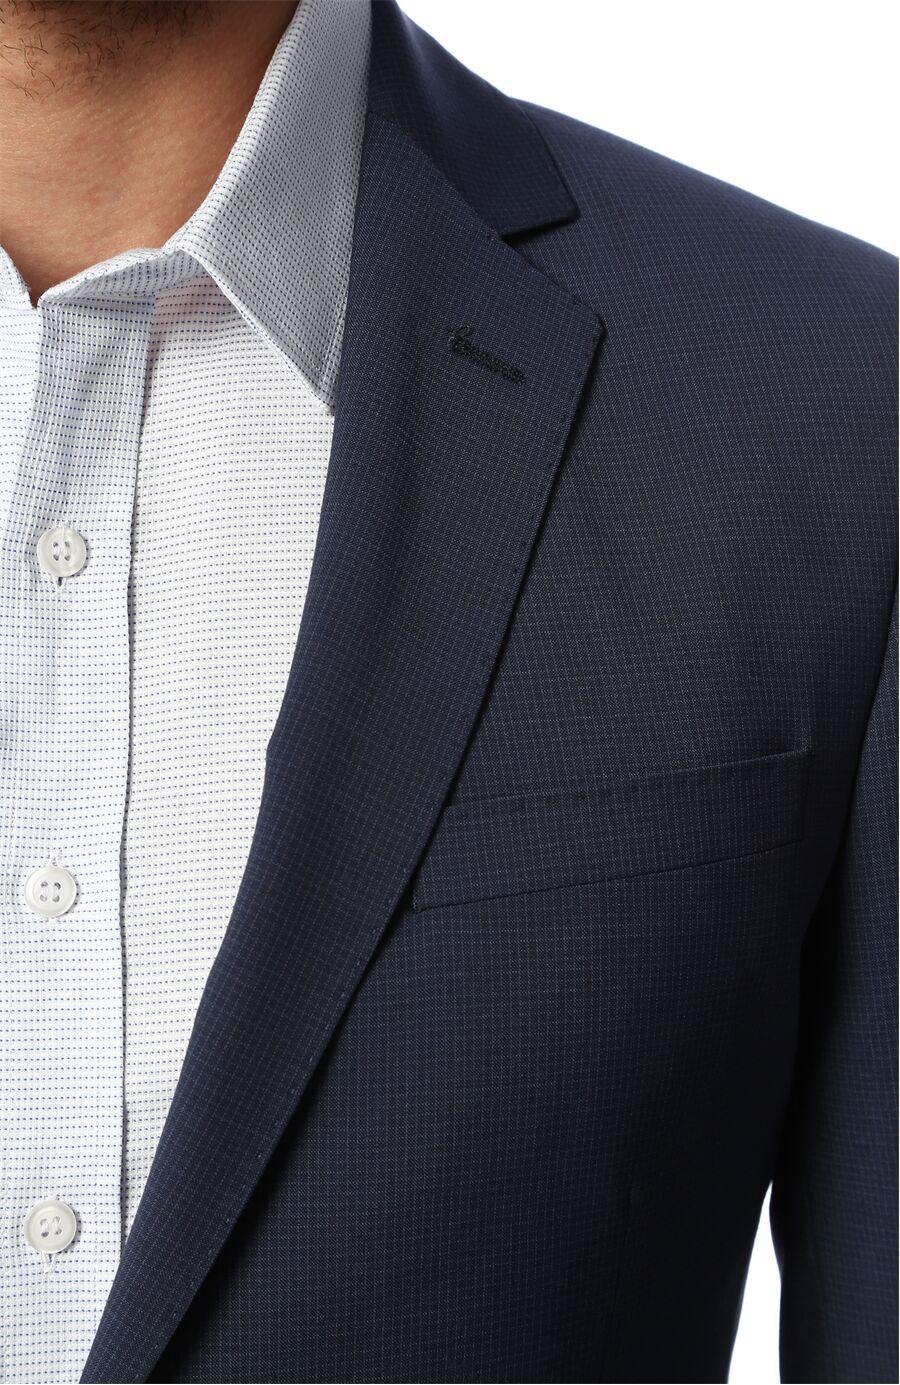 Ekose Lacivert Takım Elbise